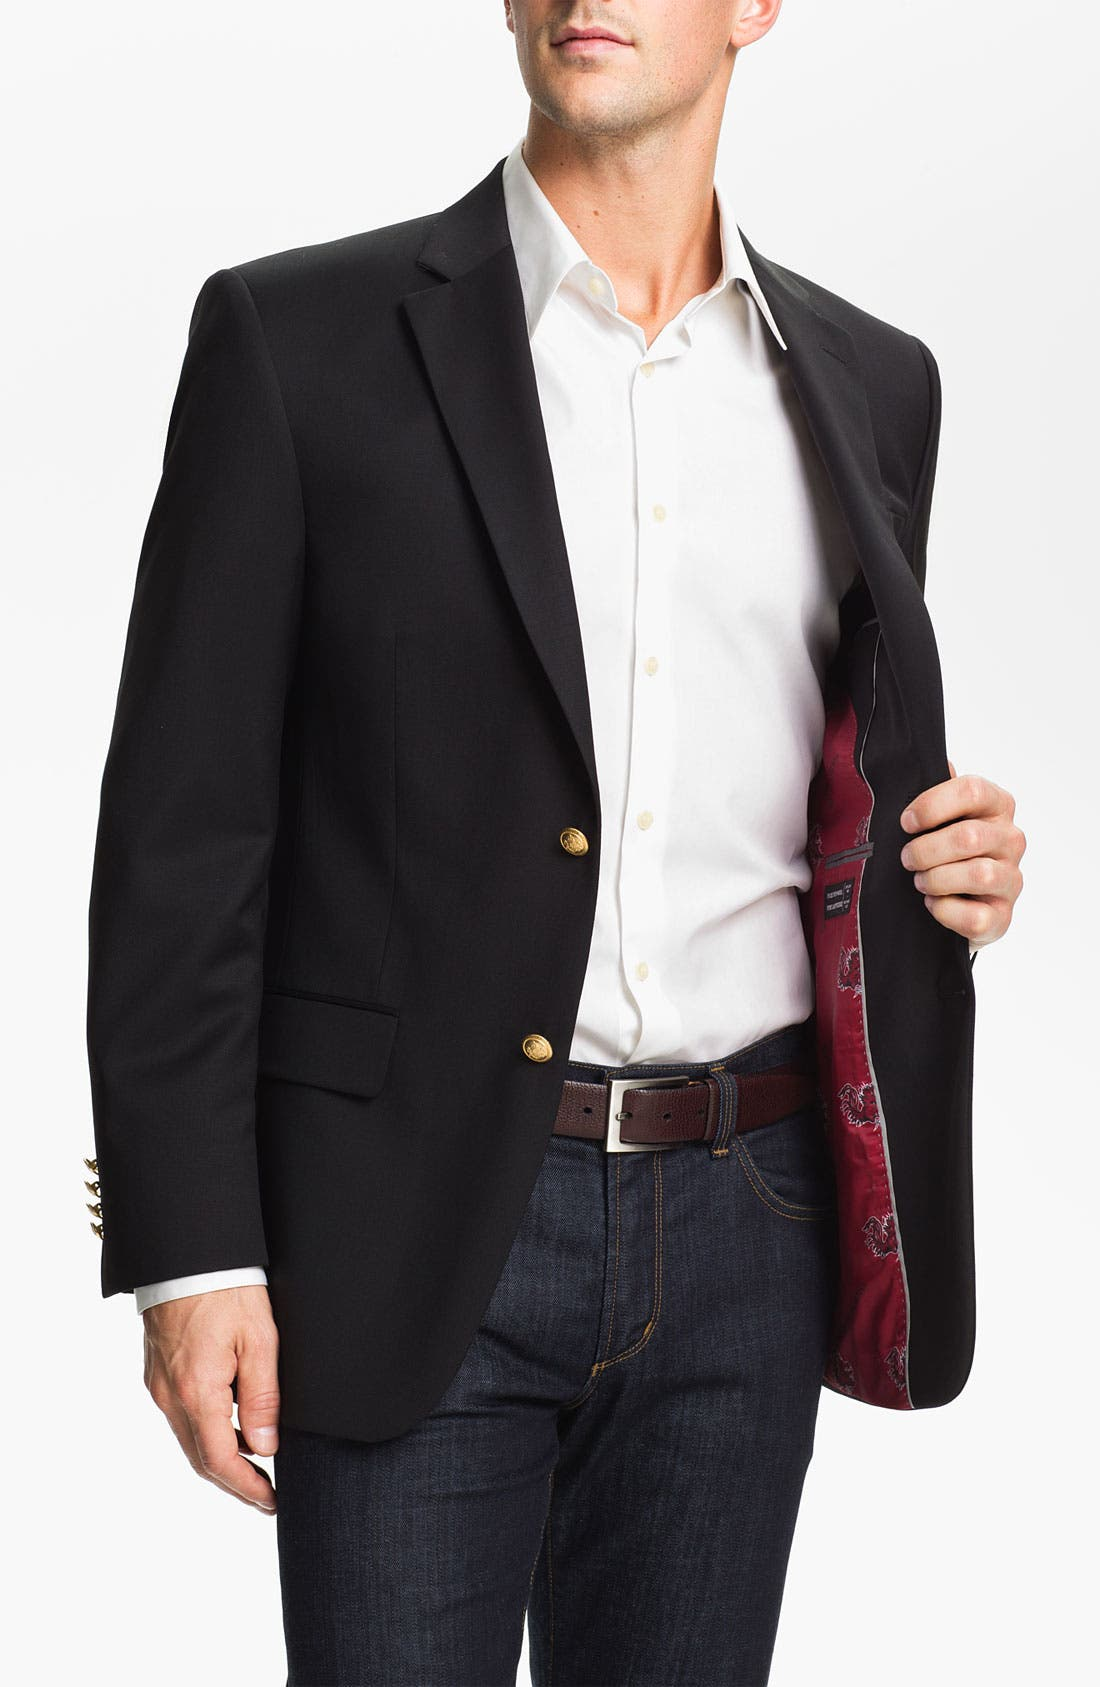 Alternate Image 1 Selected - S. Cohen 'South Carolina University' Blazer (Online Only)